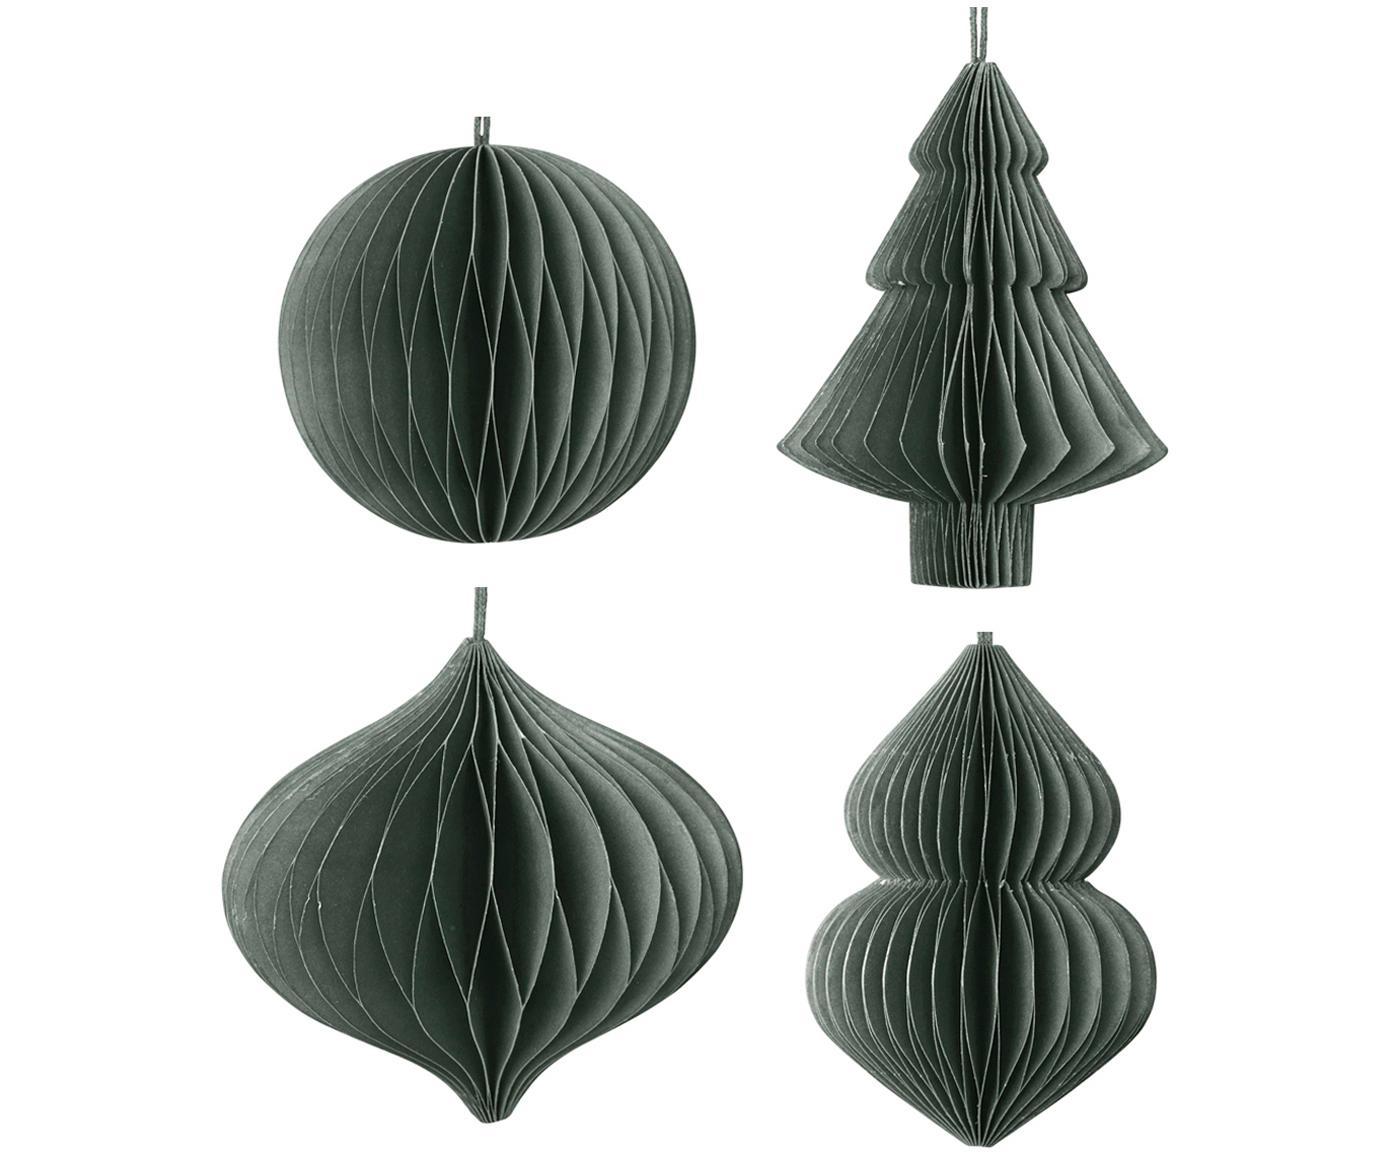 Kerstboomhangersset Christmas Mix, 4-delig, Papier, Donkergroen, Ø 9 x H 10 cm